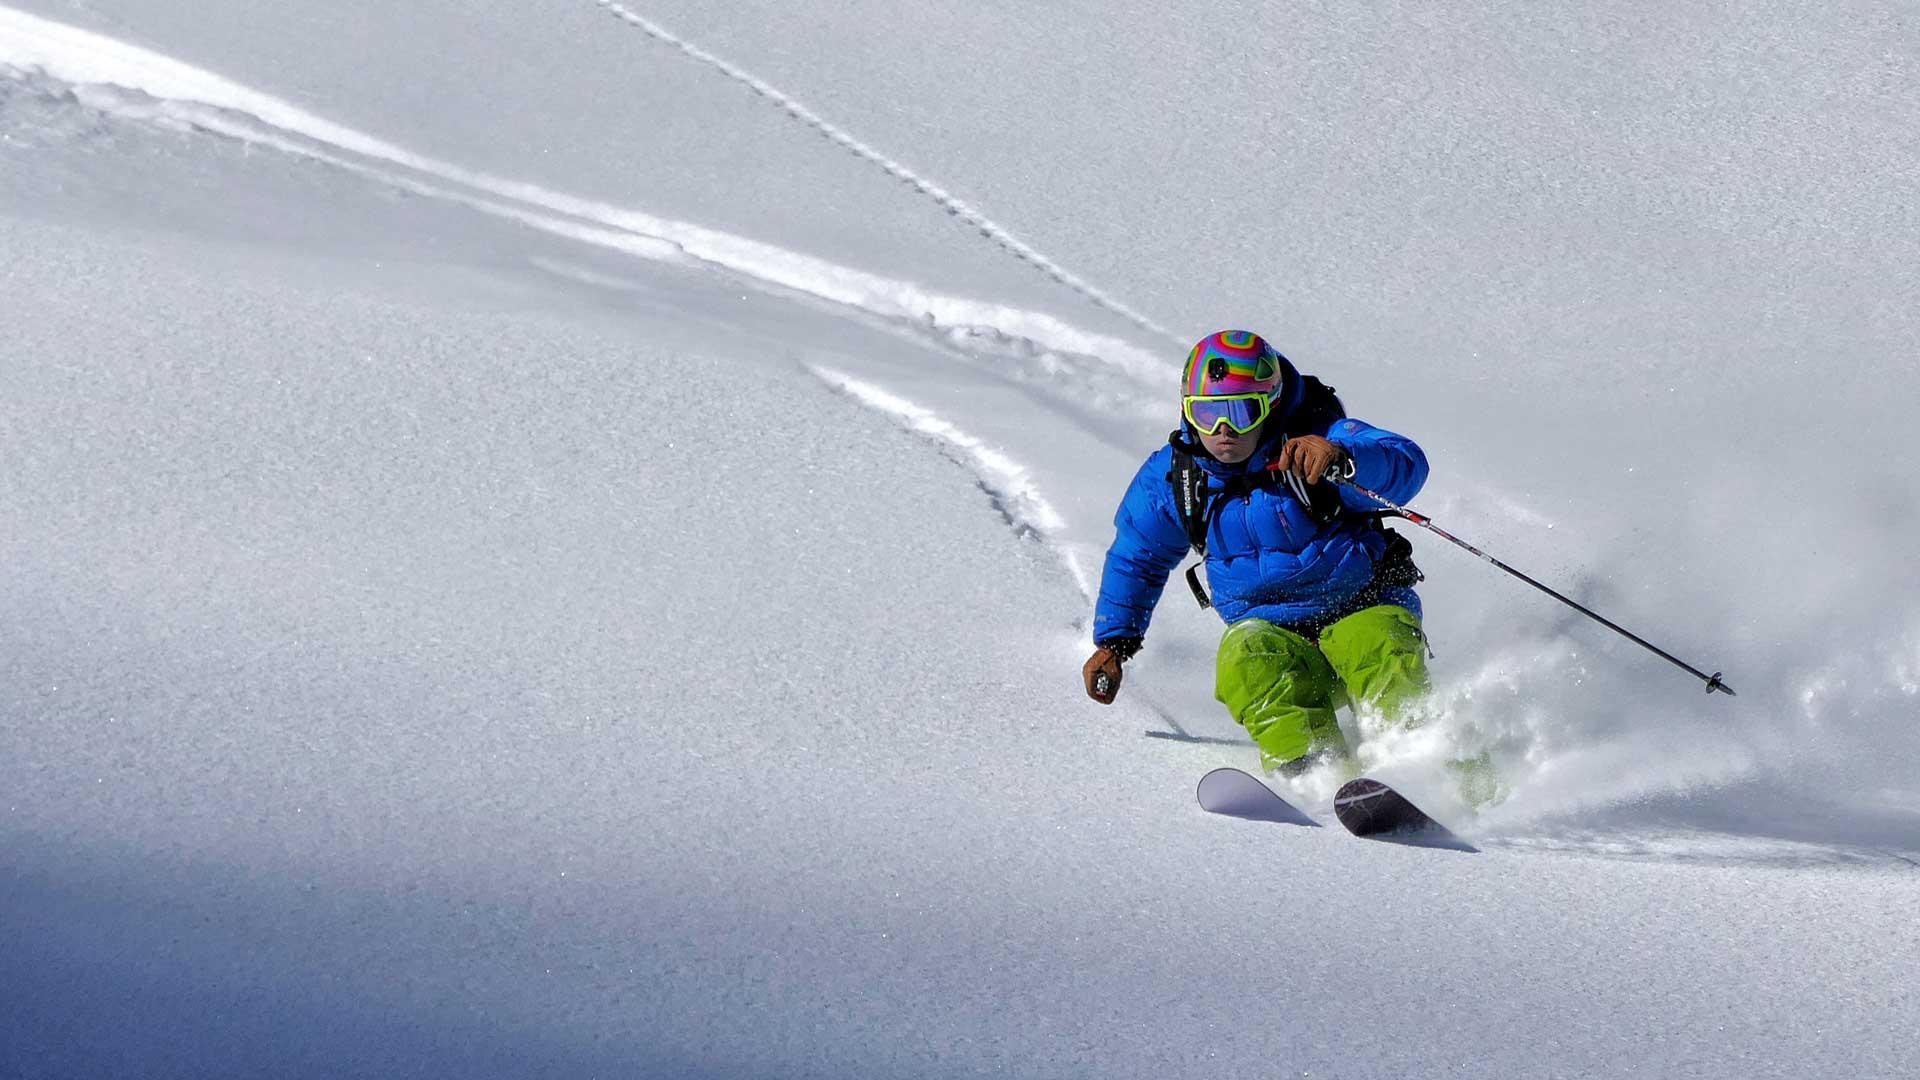 Used-Powder-Skis-On-DailyMirror.Today